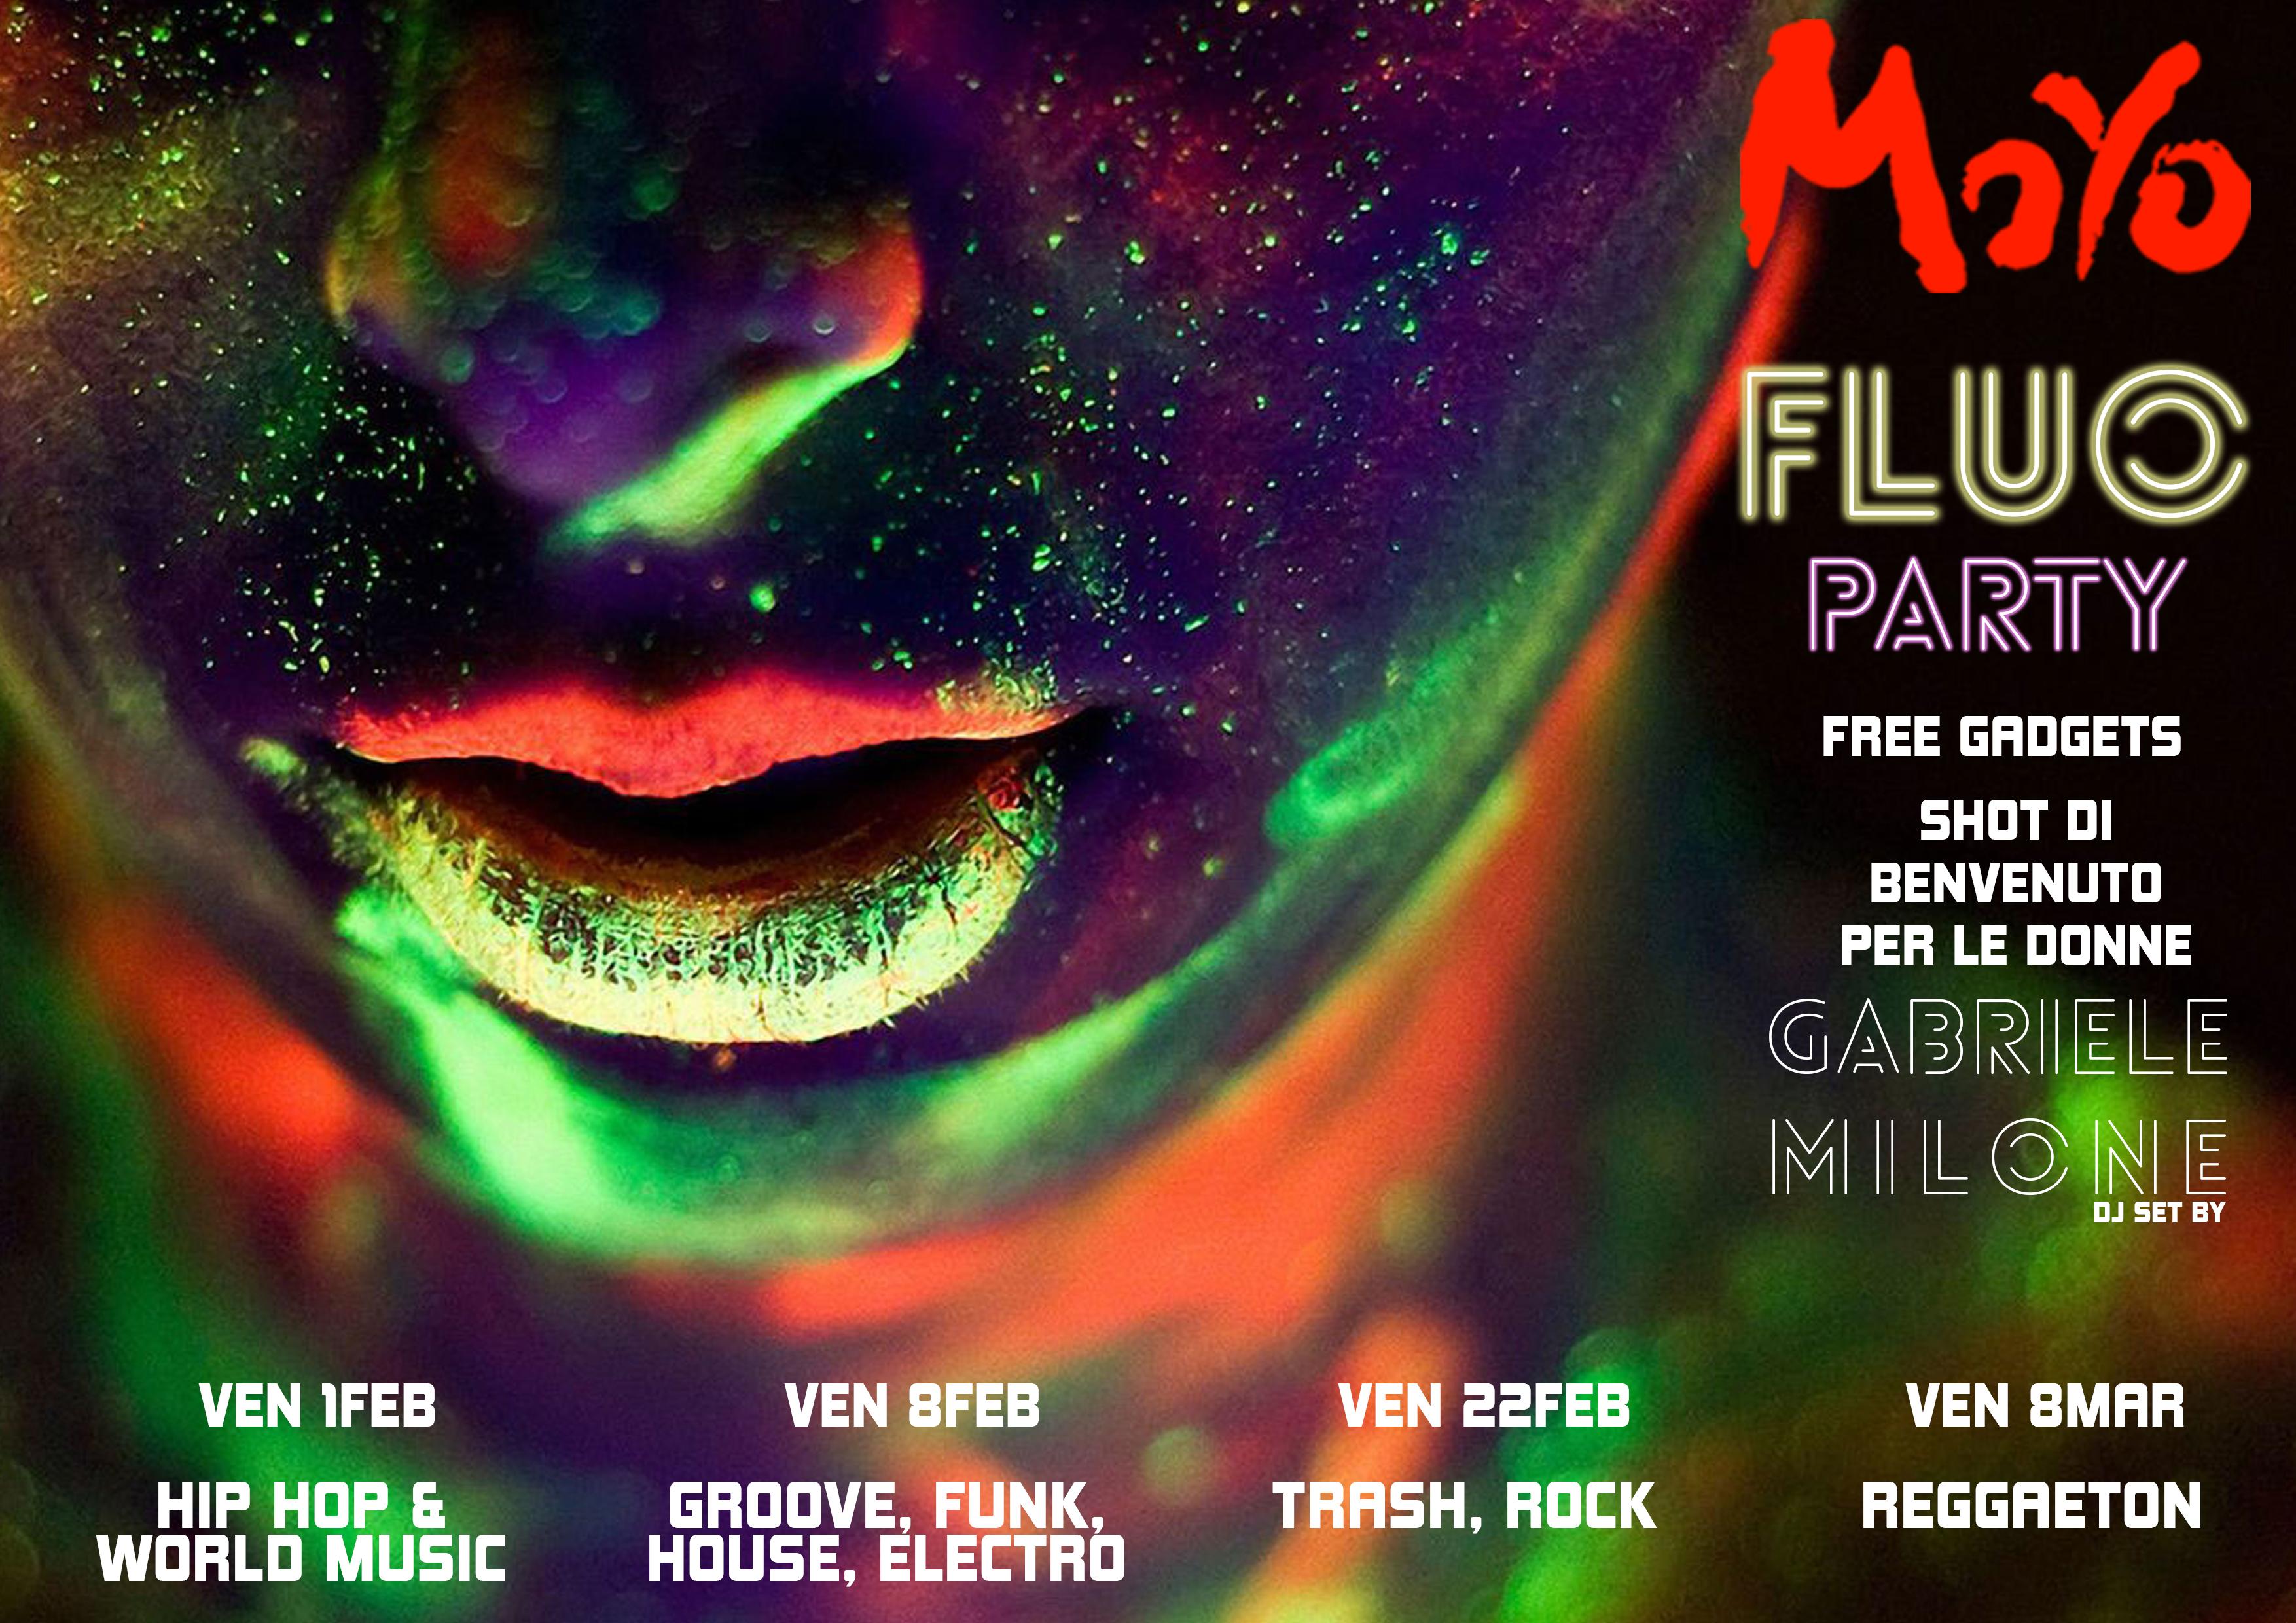 fluo party programma